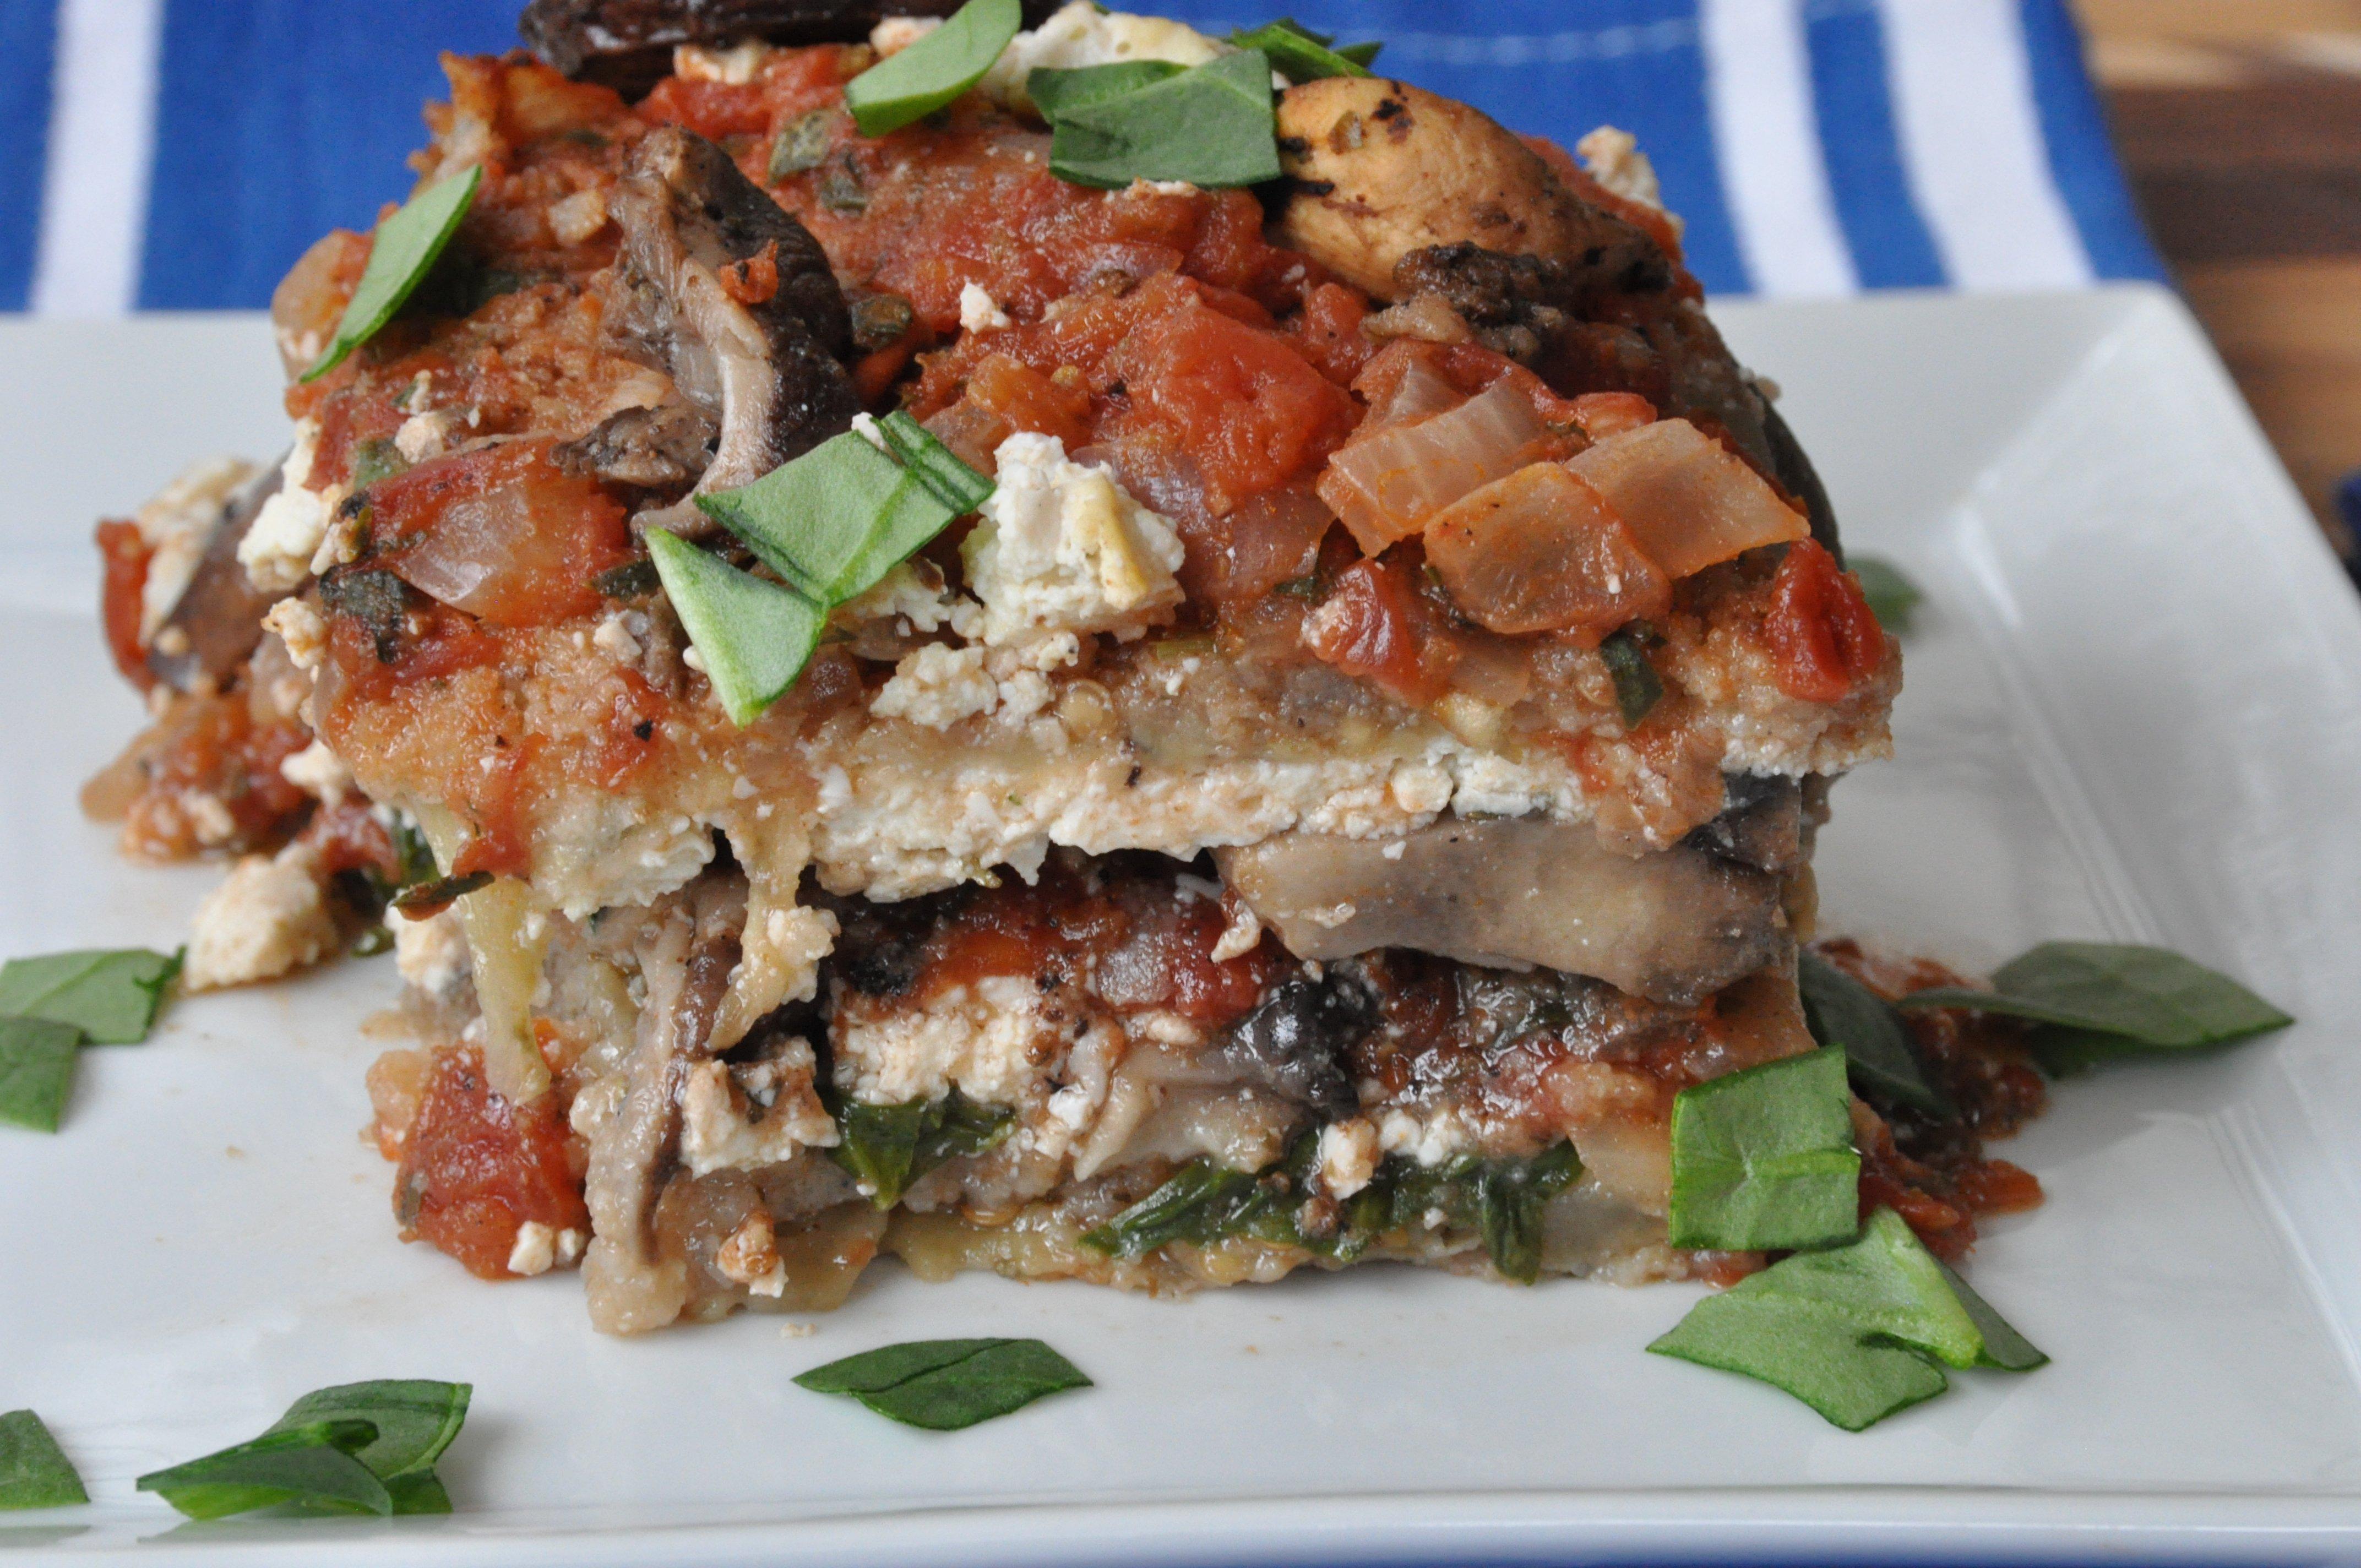 Vegan Eggplant Lasagna - Veganosity